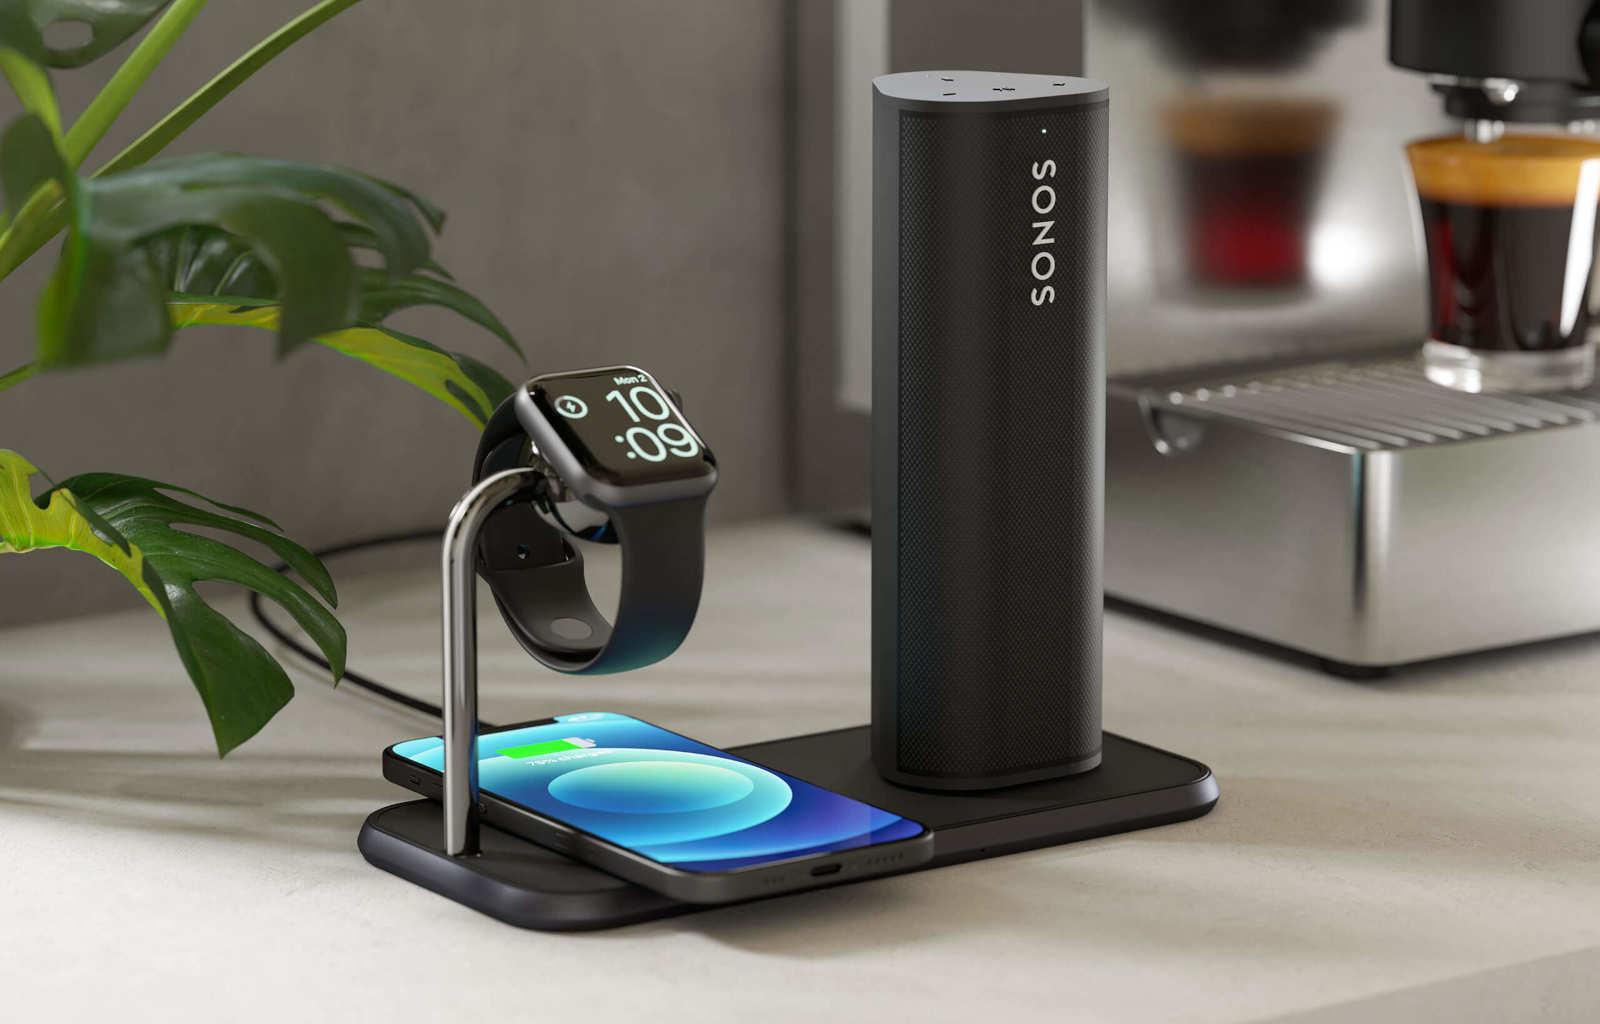 Aluminium Series wireless charging station charging Apple Watch, iPhone 12 and Sonos Roam